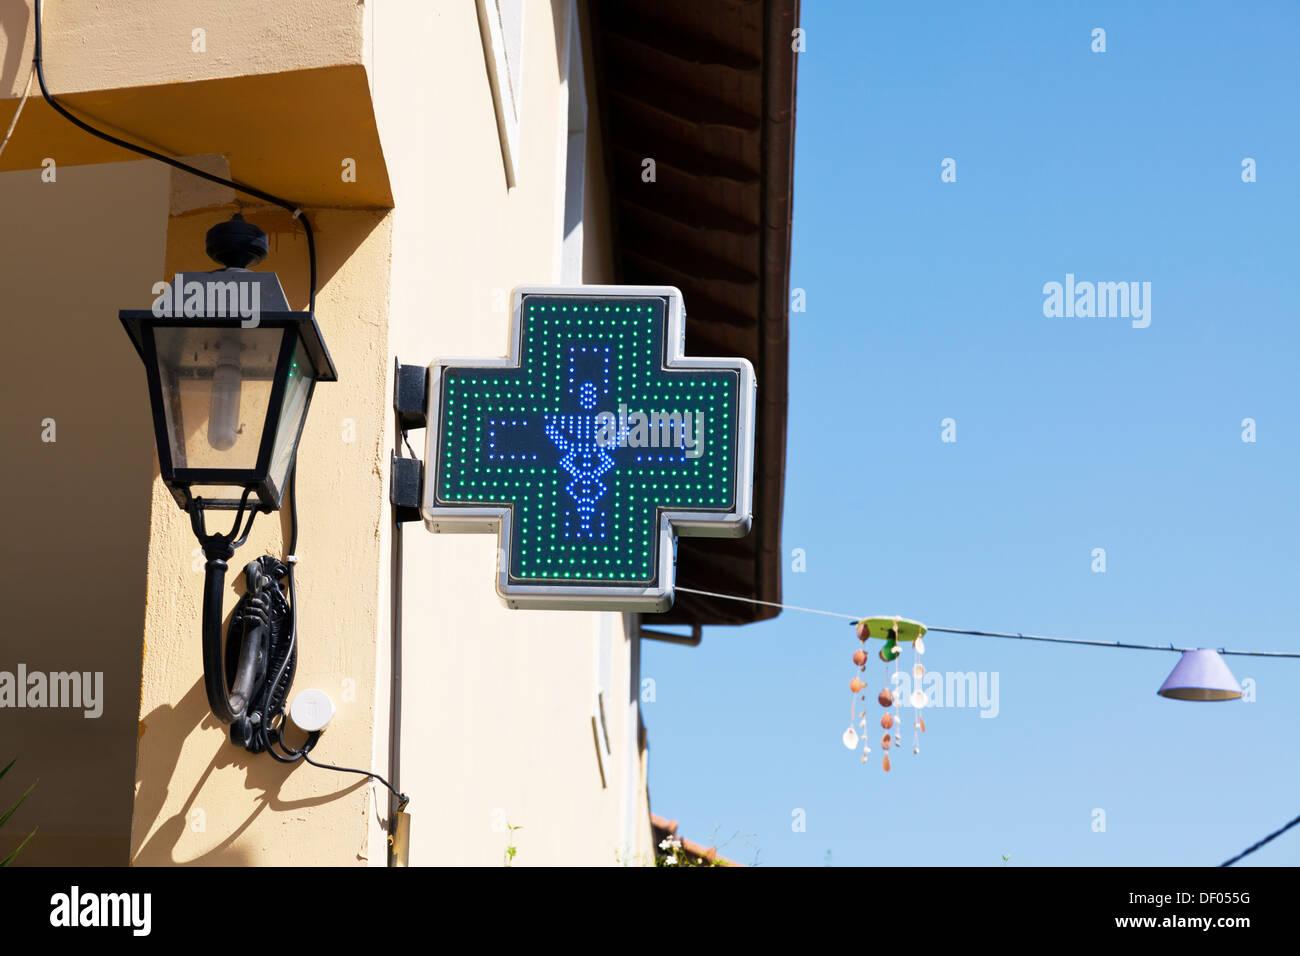 Pharmacist chemist exterior sign on main street Lefkada Lefkas Town Greek Island Greece - Stock Image